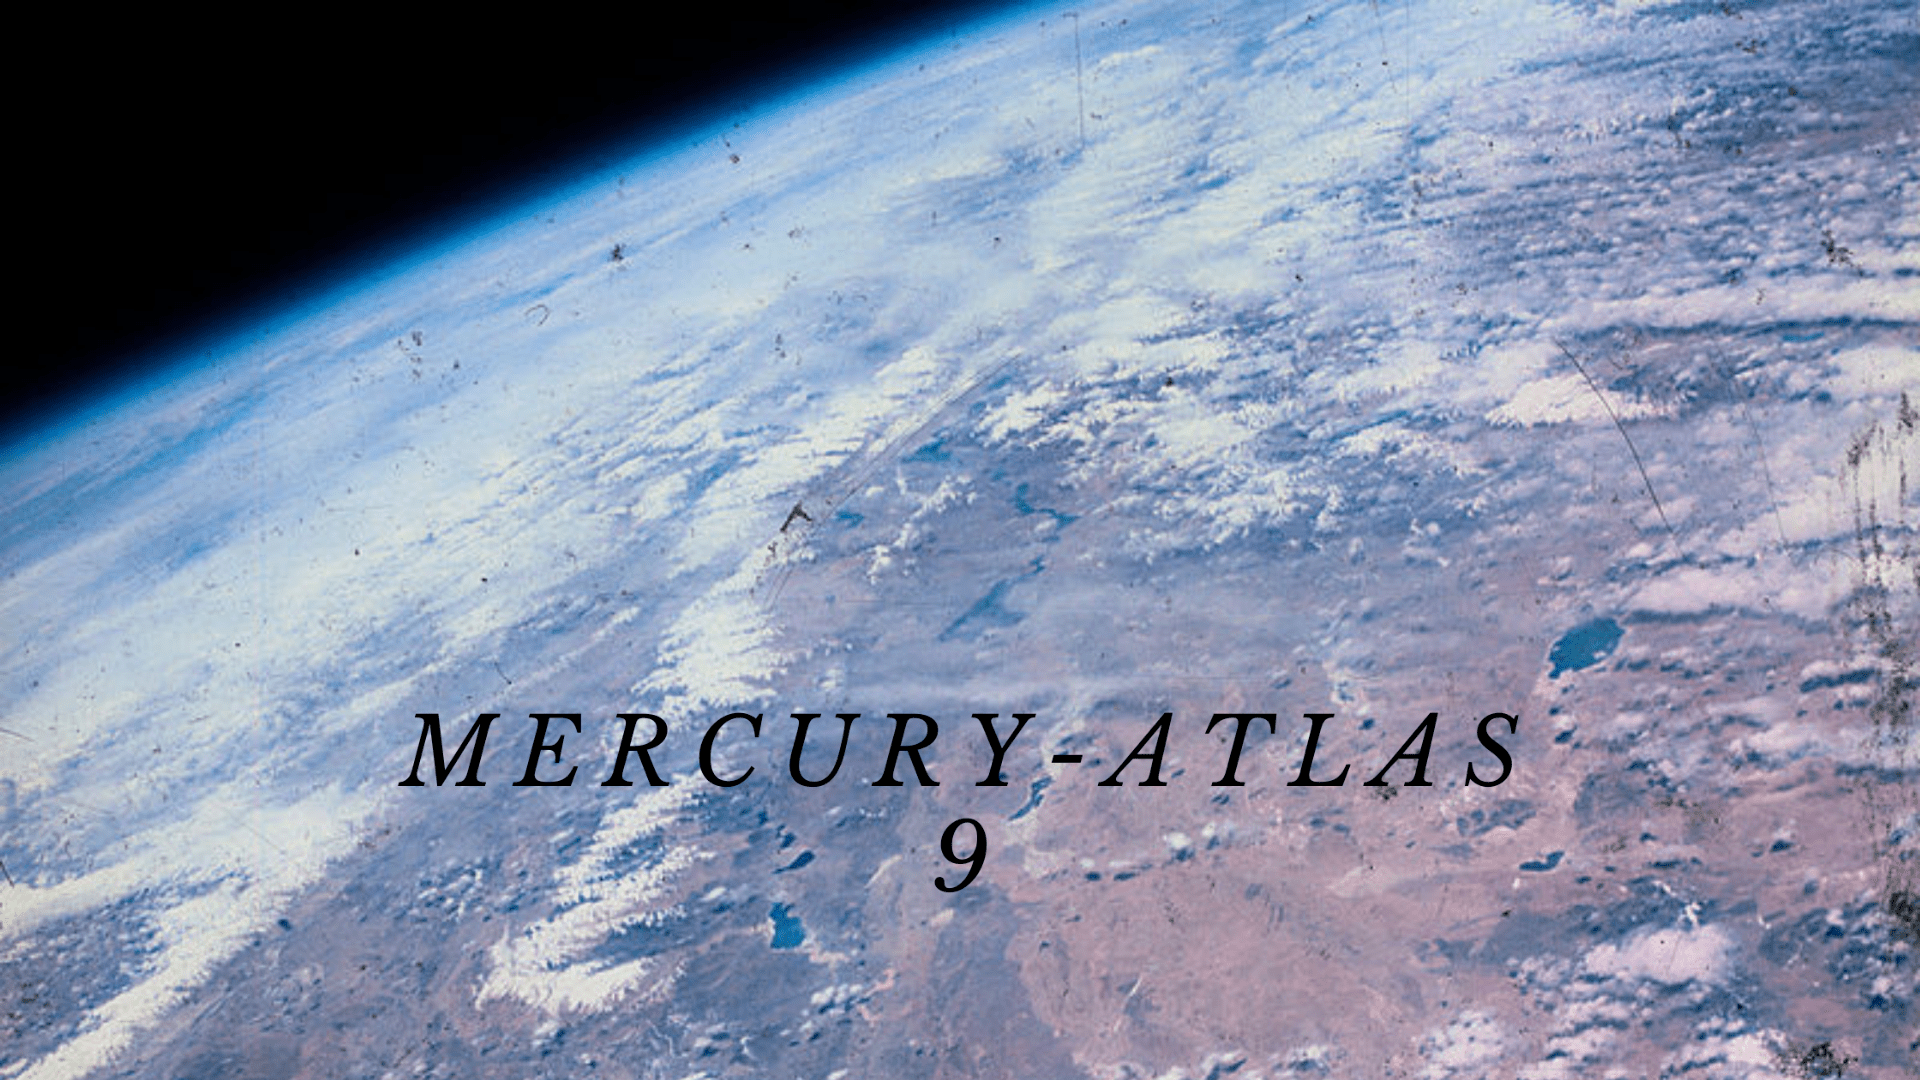 Mercury Atlas 9 header